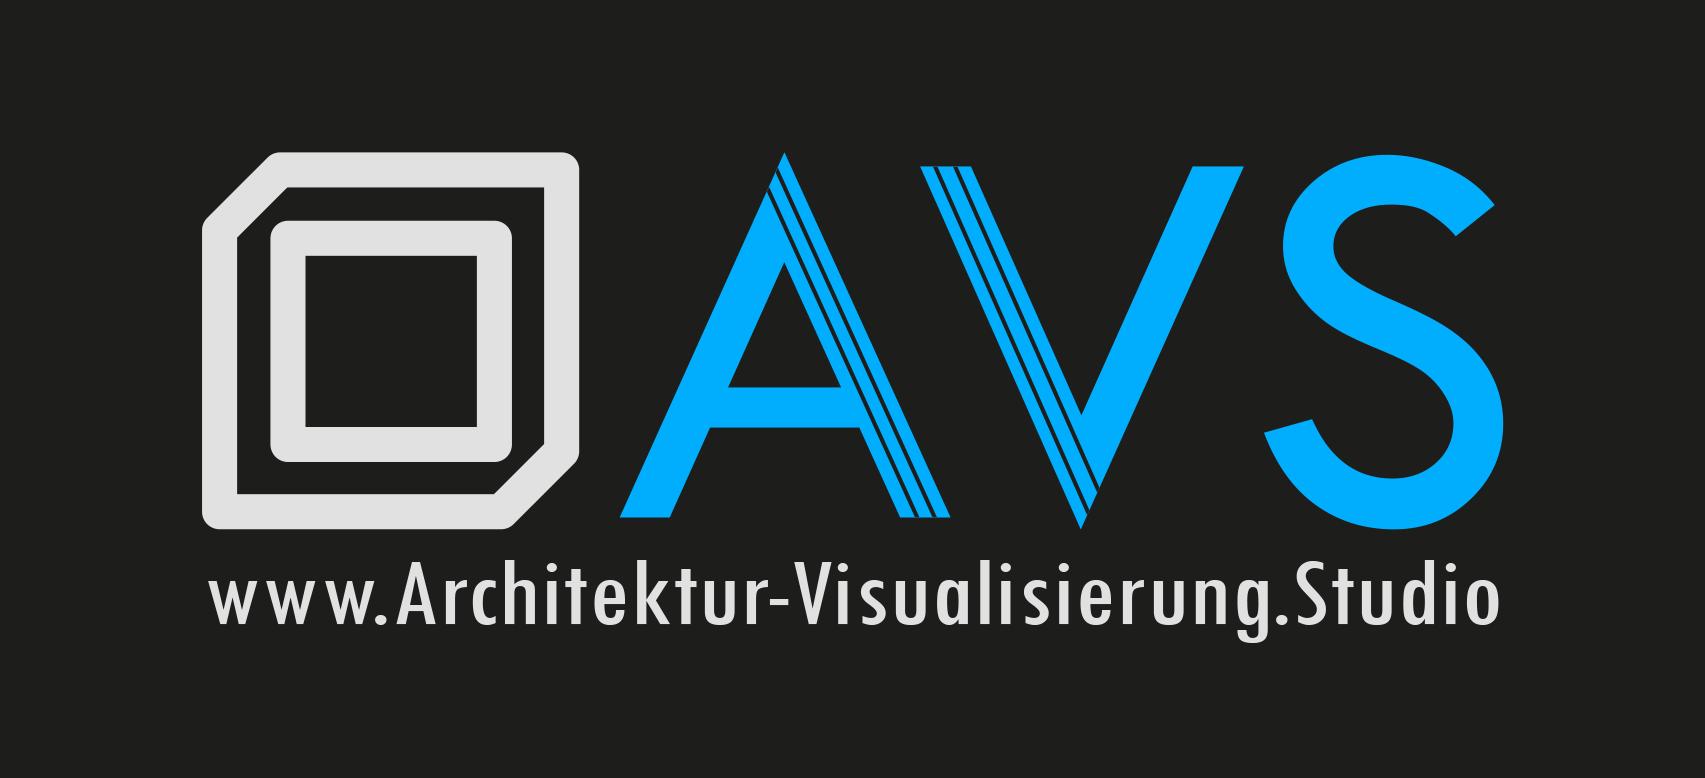 AVS | Architektur-Visualisierung.Studio